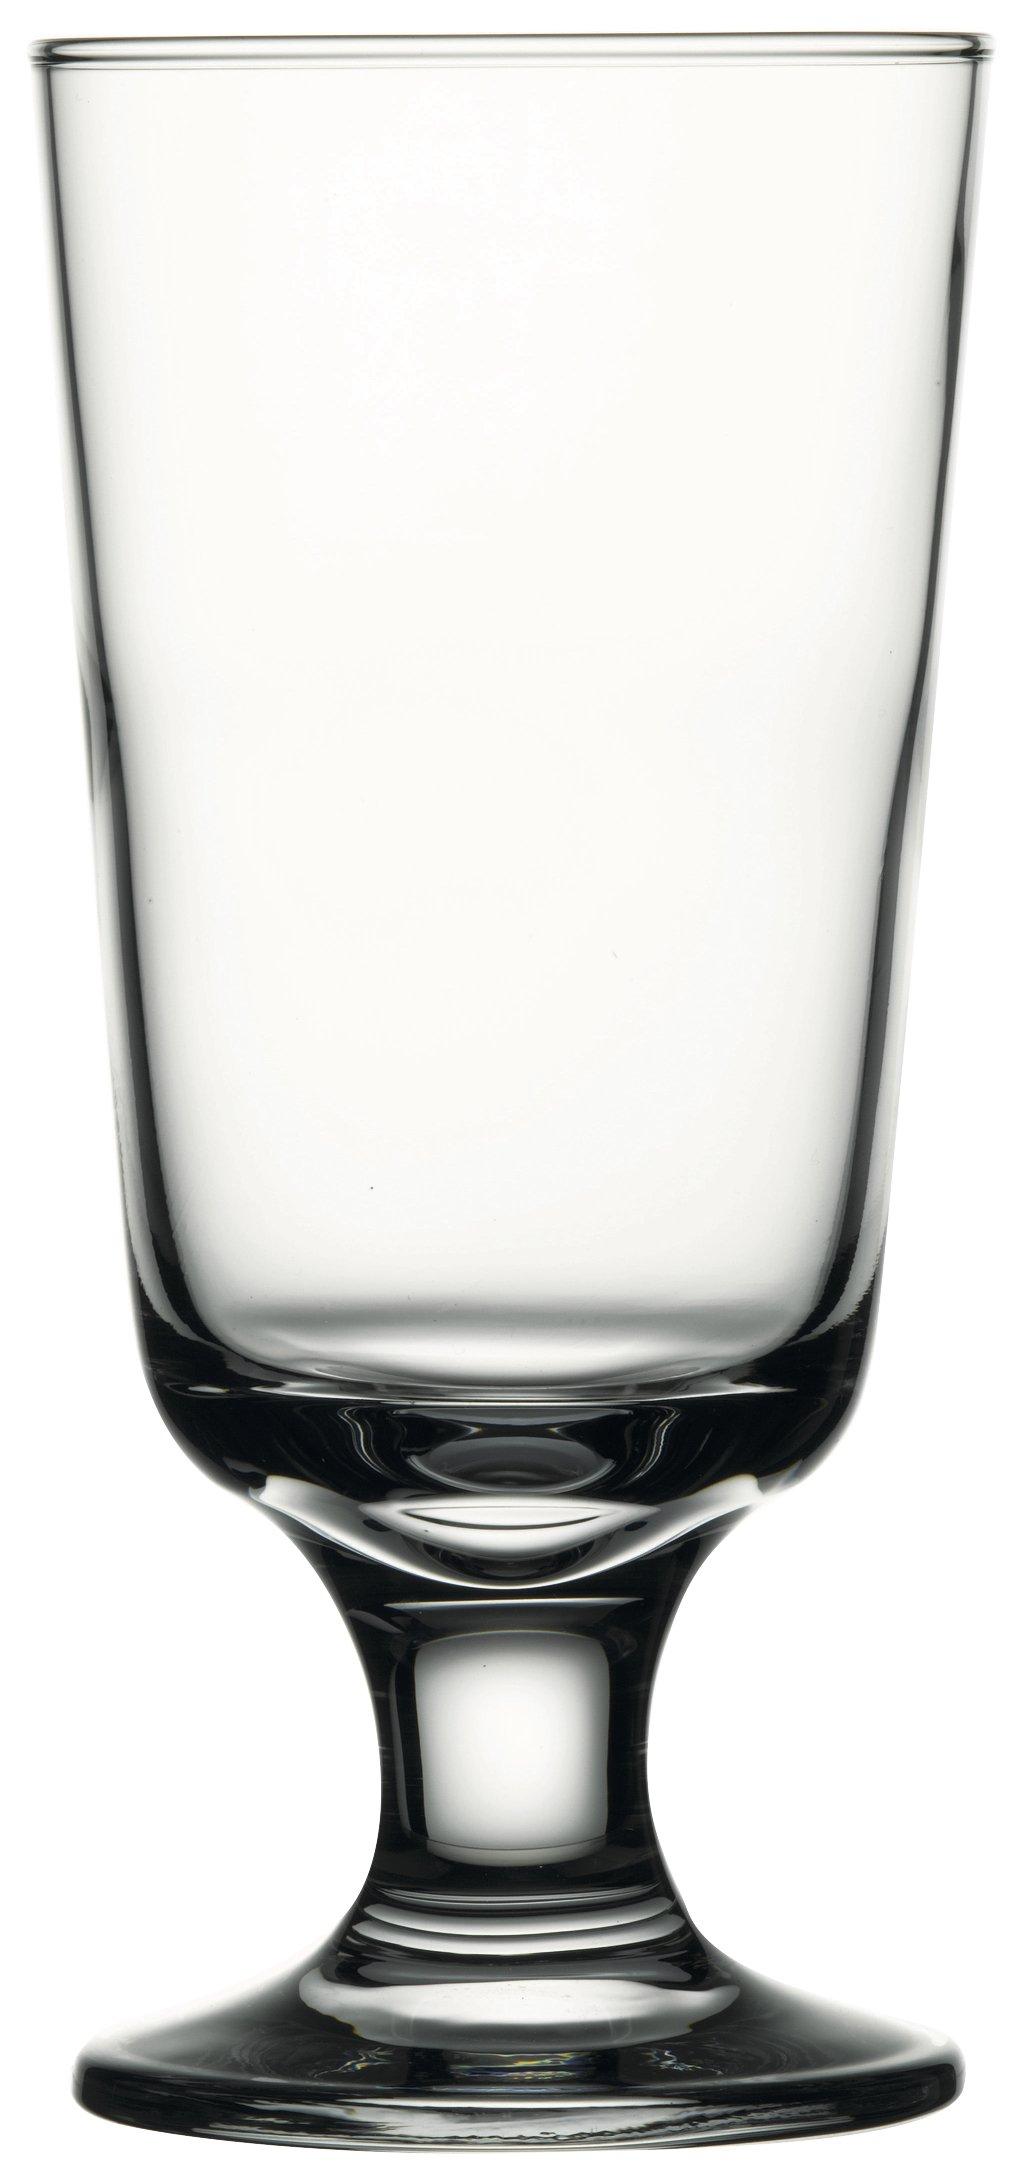 Hospitality Glass Brands 44912-048 Capri 10 oz. Taverna Footed Hi-Ball (Pack of 48)